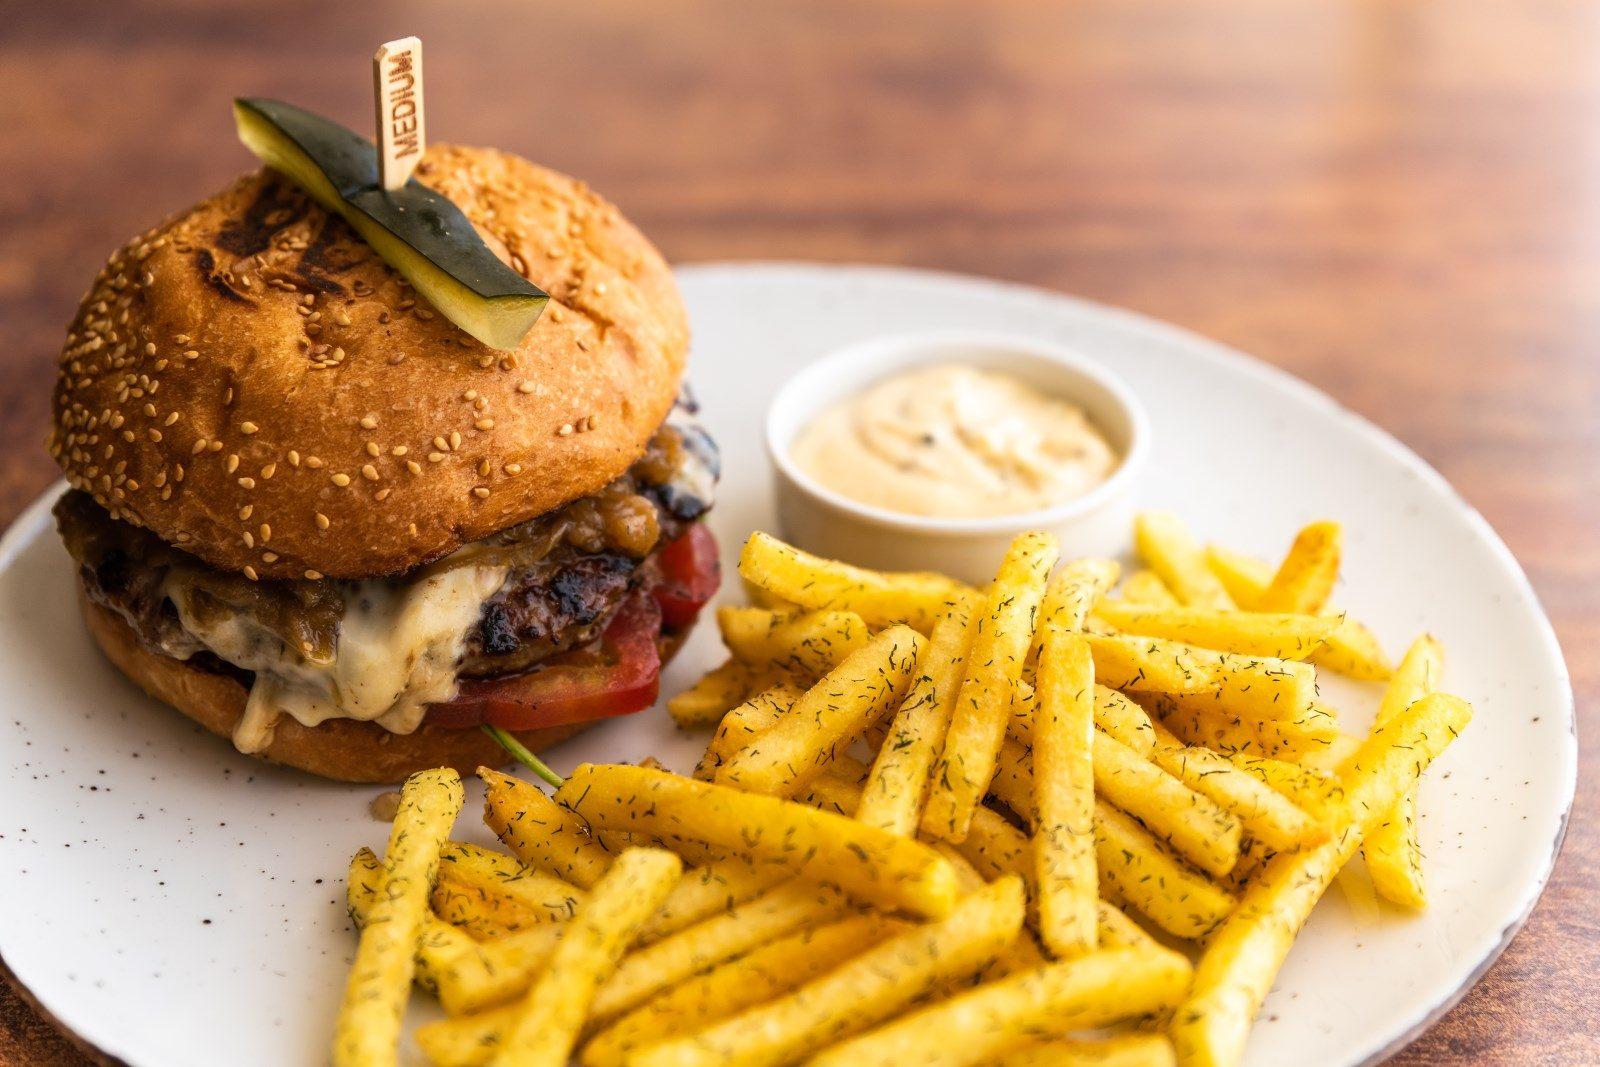 sunset beach dubrovnik trattoria burger